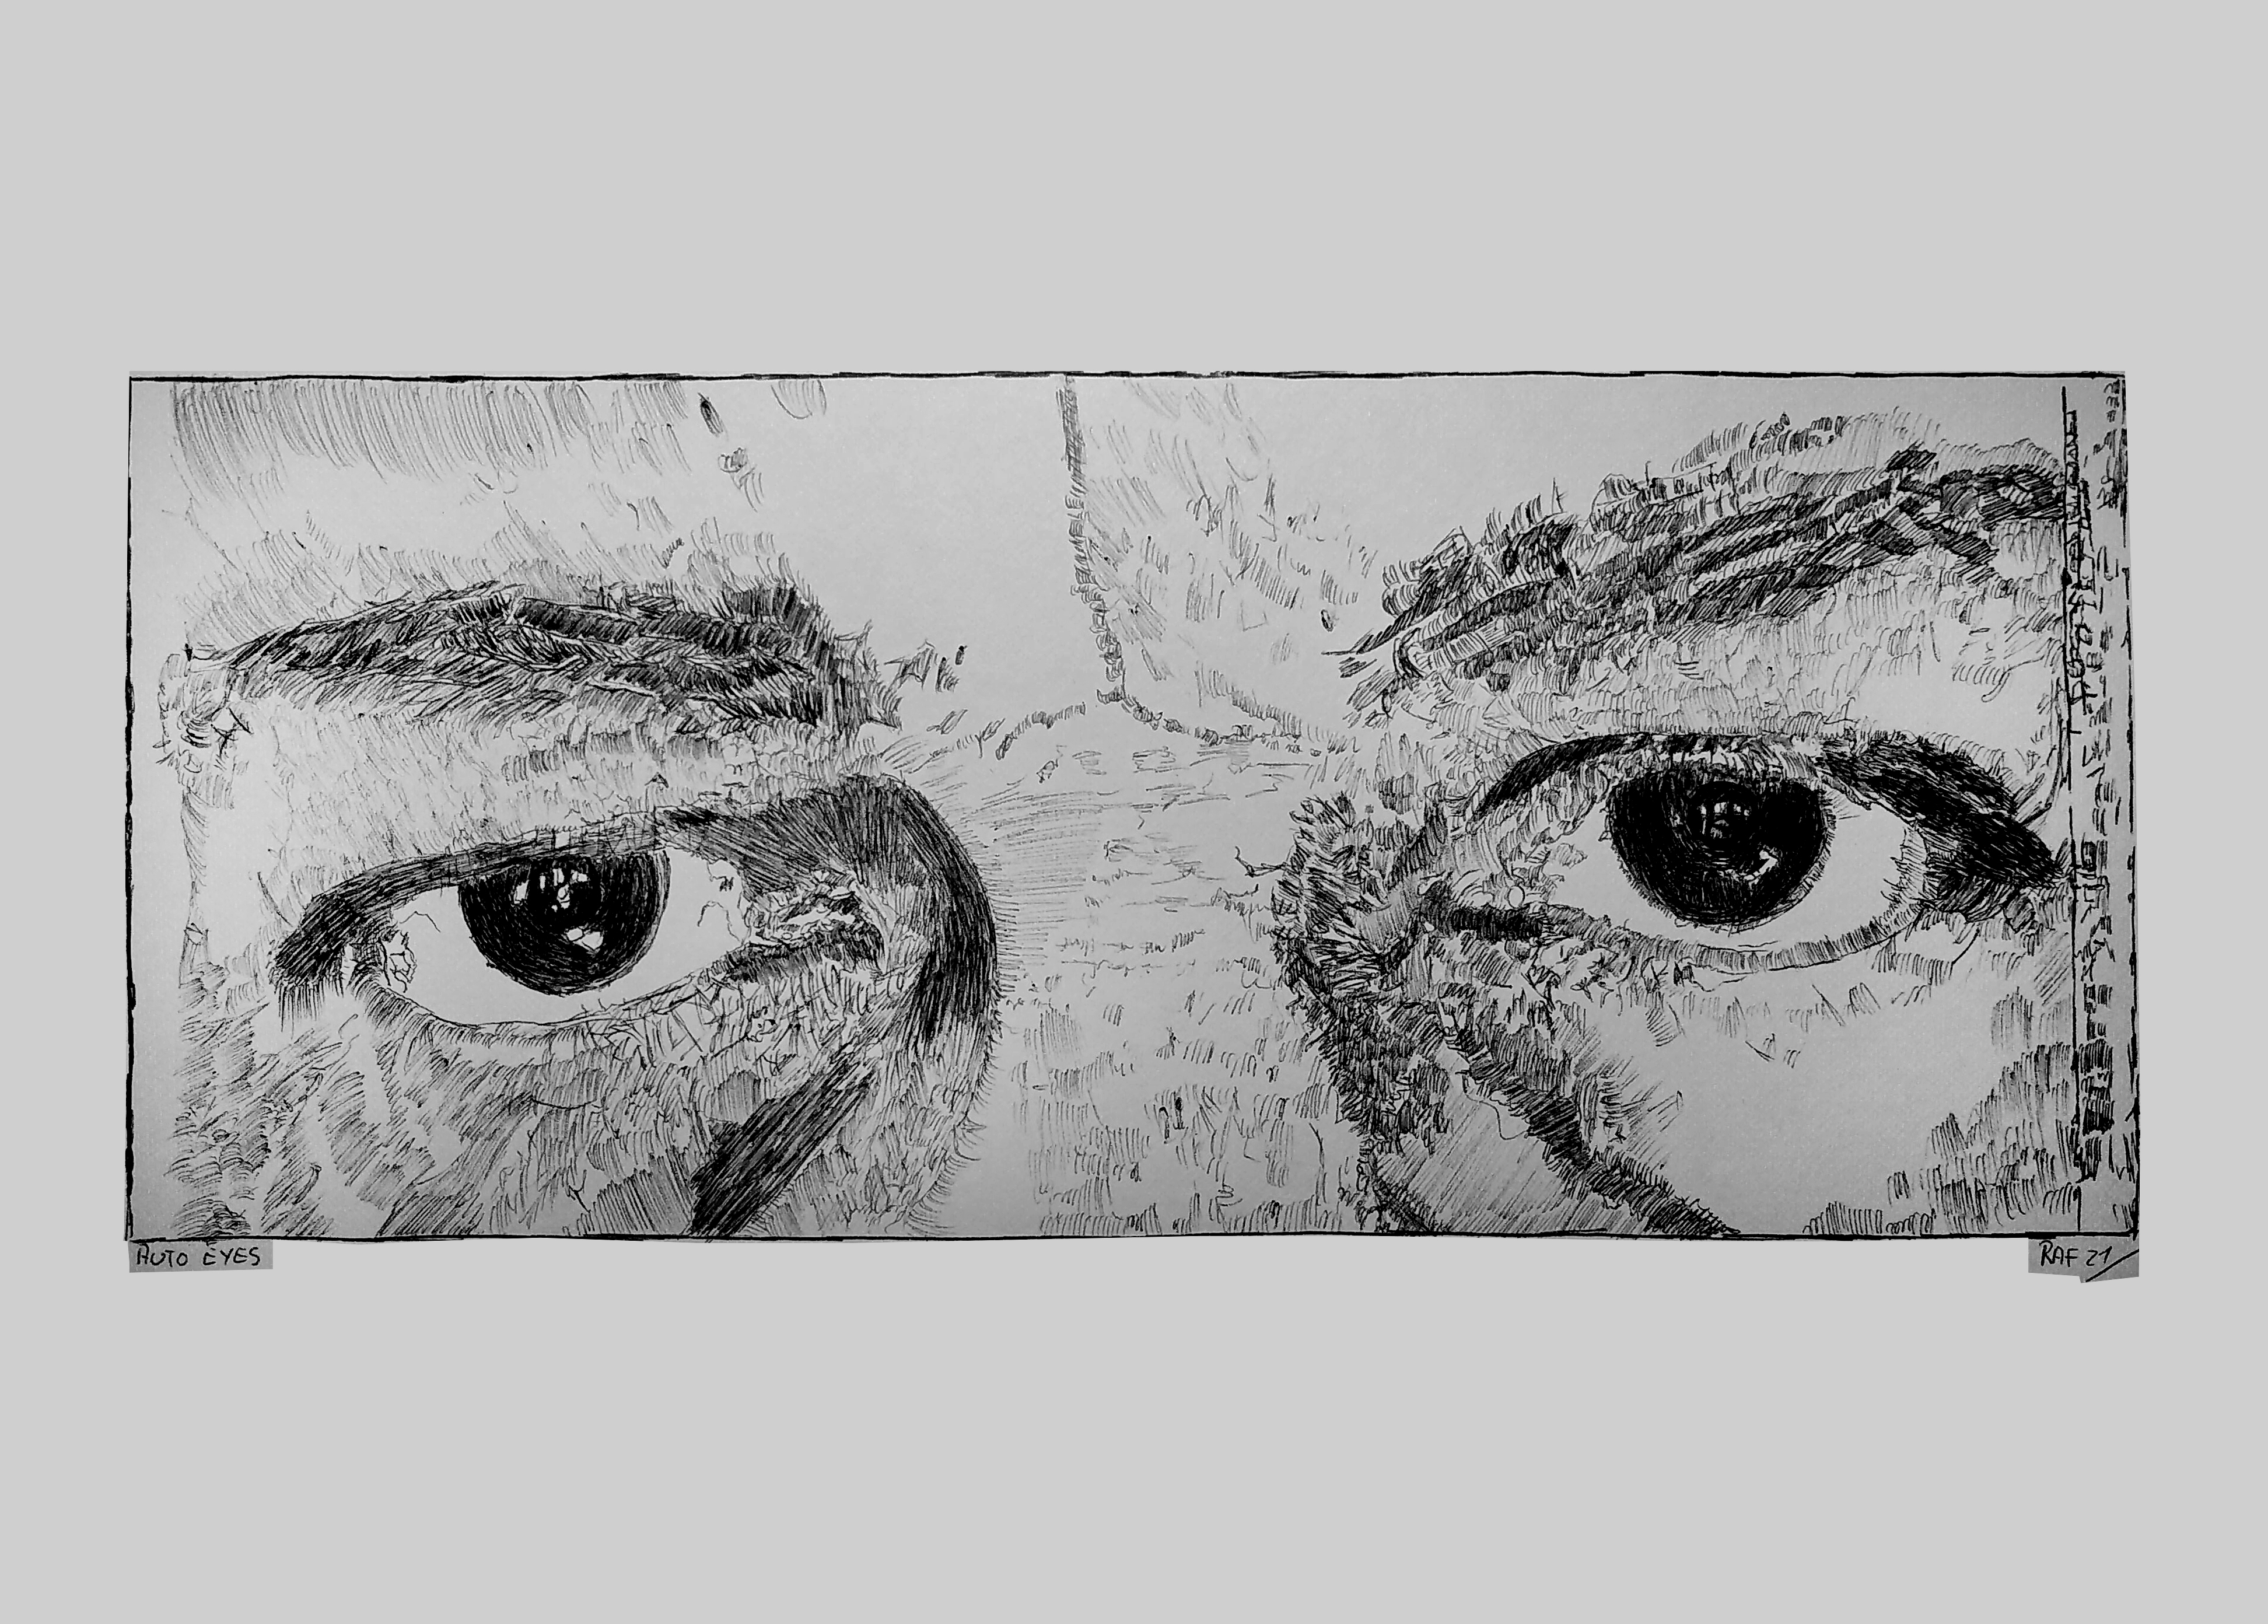 Auto Eyes